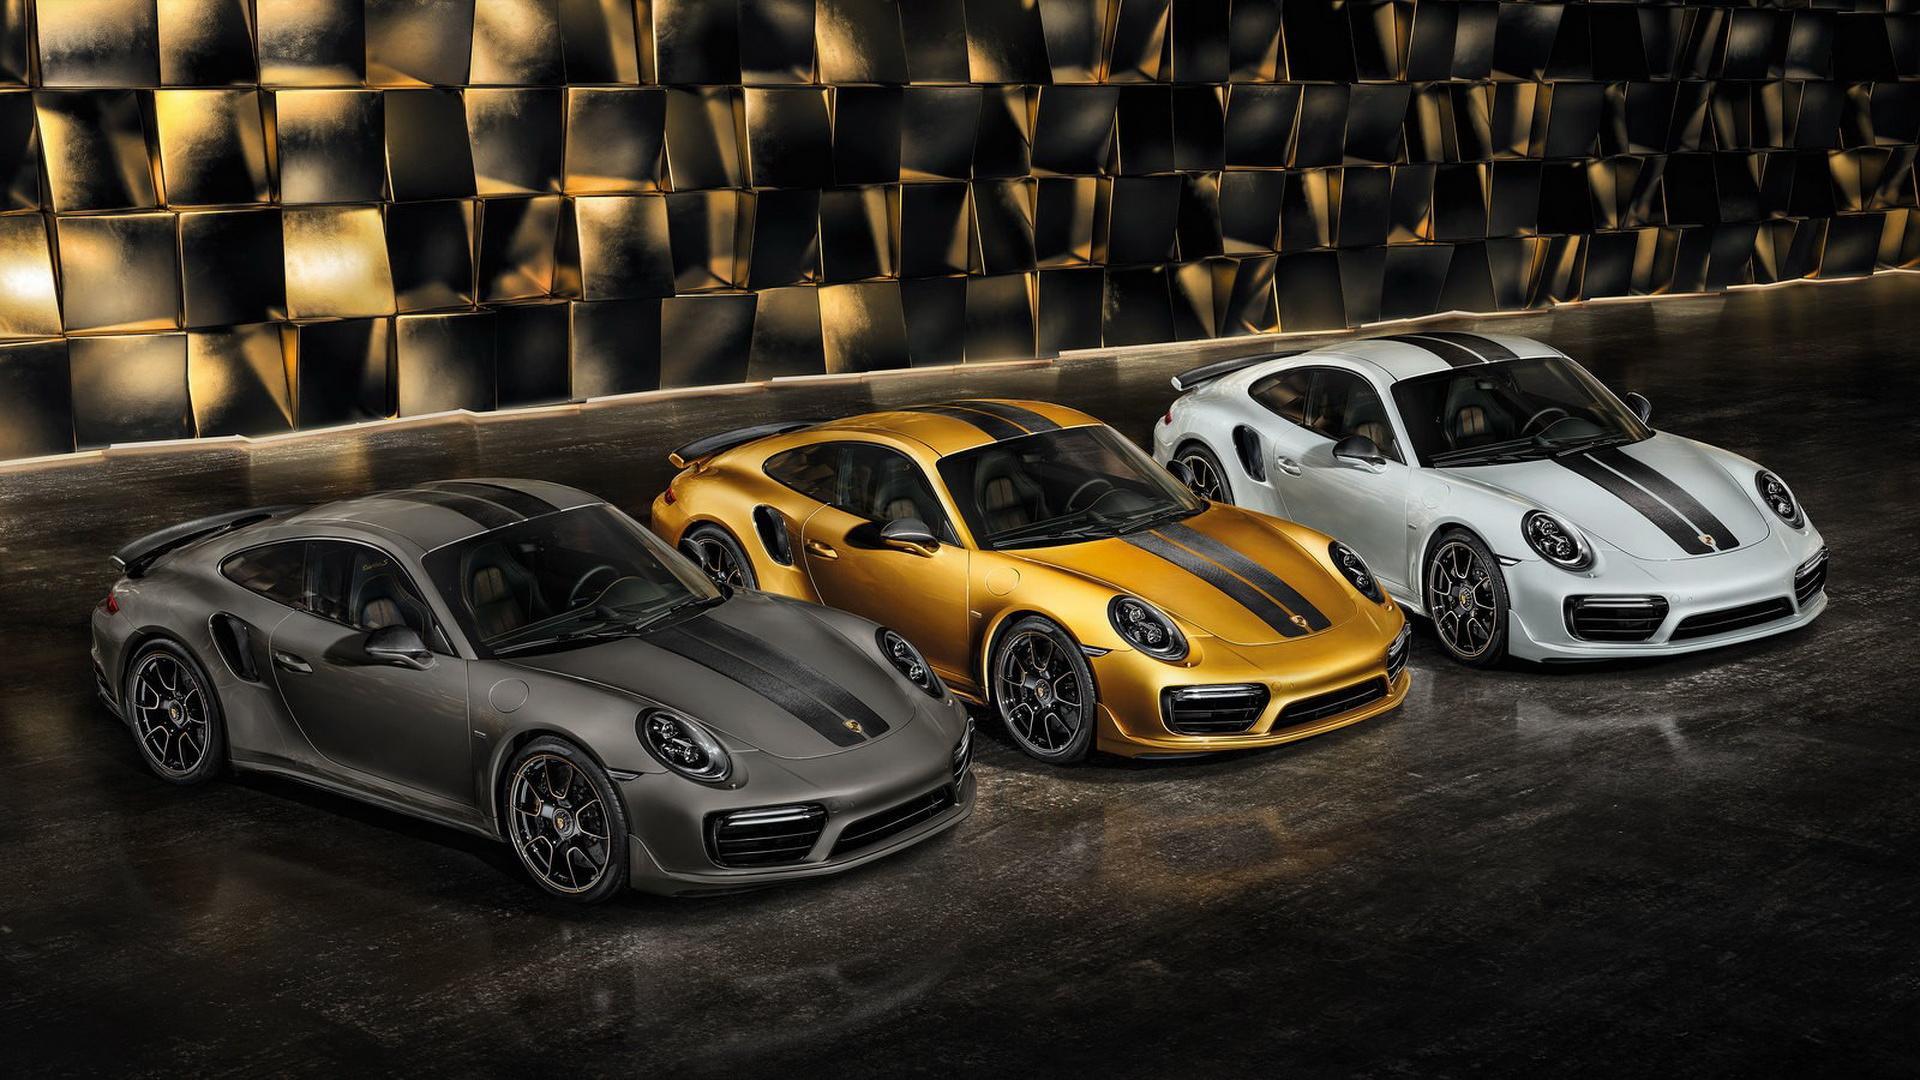 Porsche_911_Turbo_S_Exclusive_Series_23